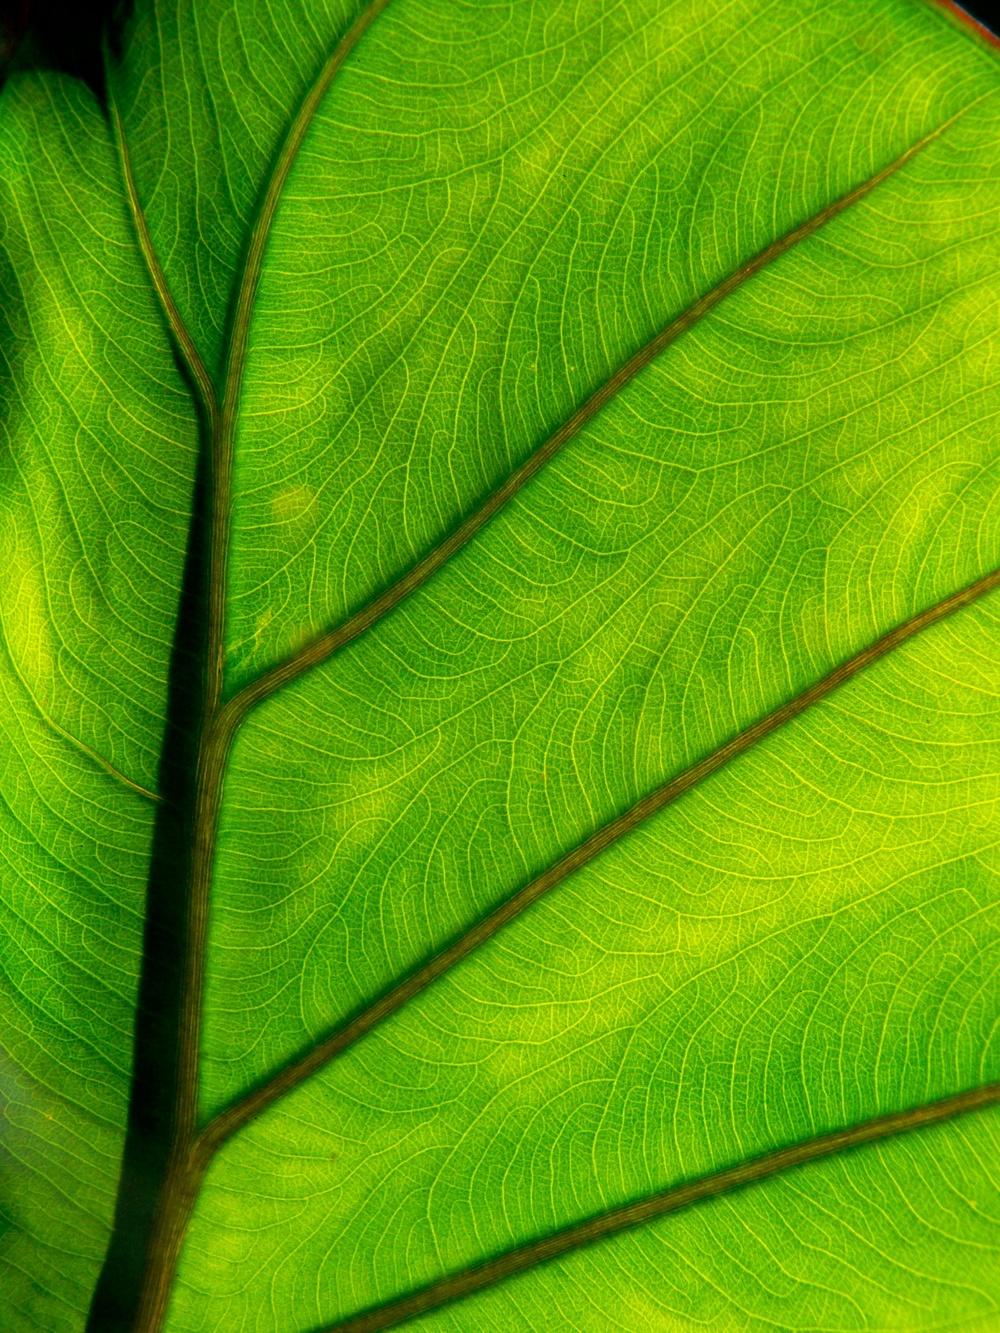 Tropical Leaf Detail - color